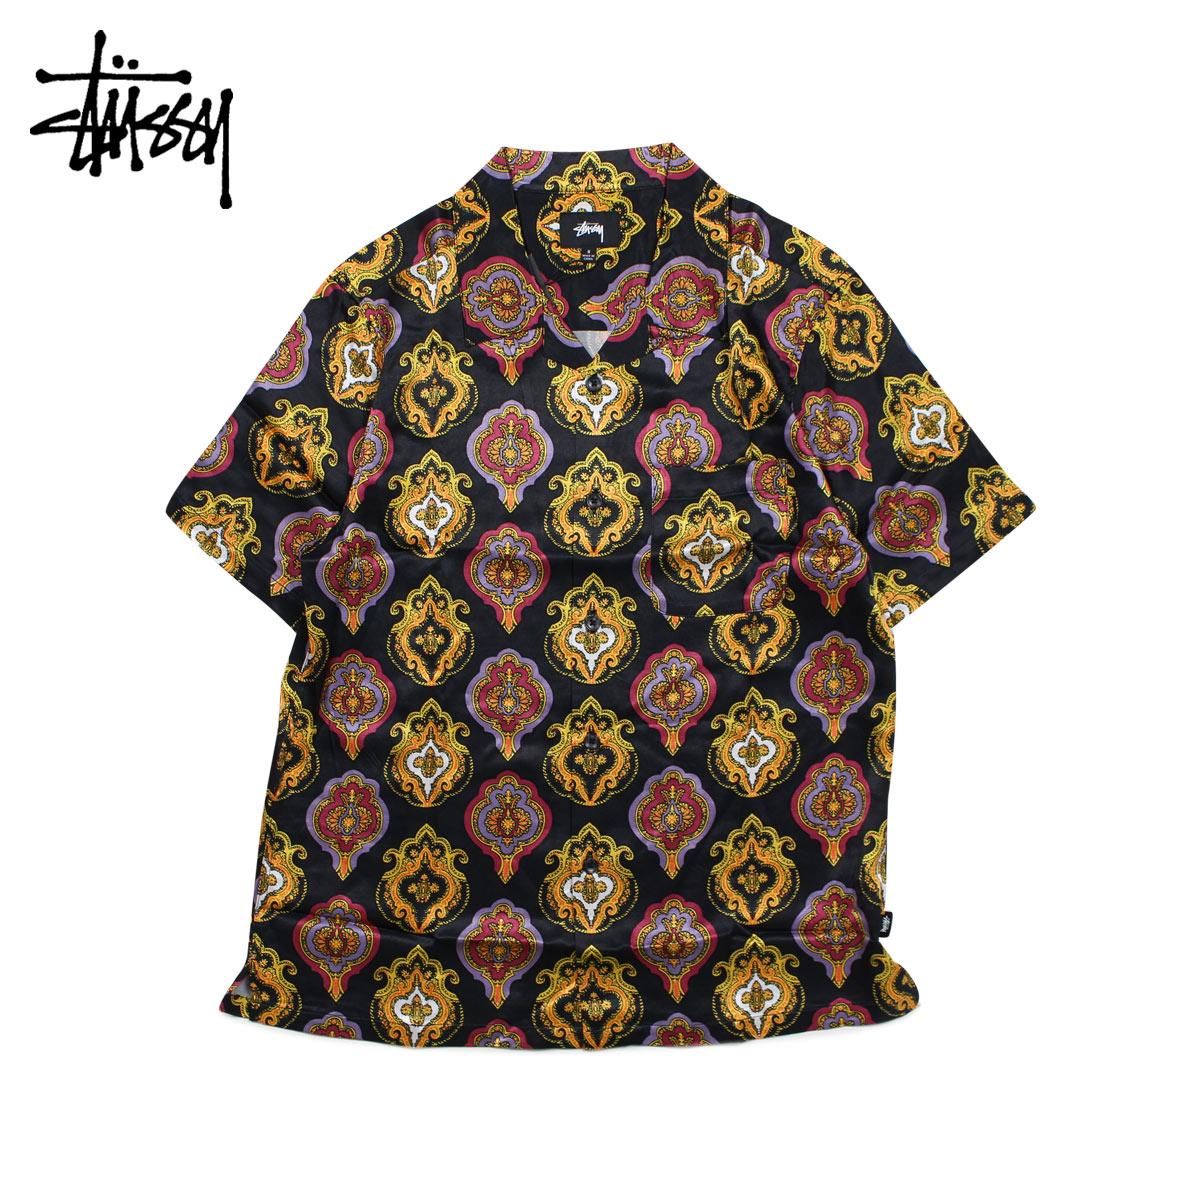 STUSSY SHIELD SHIRT ステューシー シャツ メンズ 半袖 ブラック 黒 1110027 [6/18 新入荷]